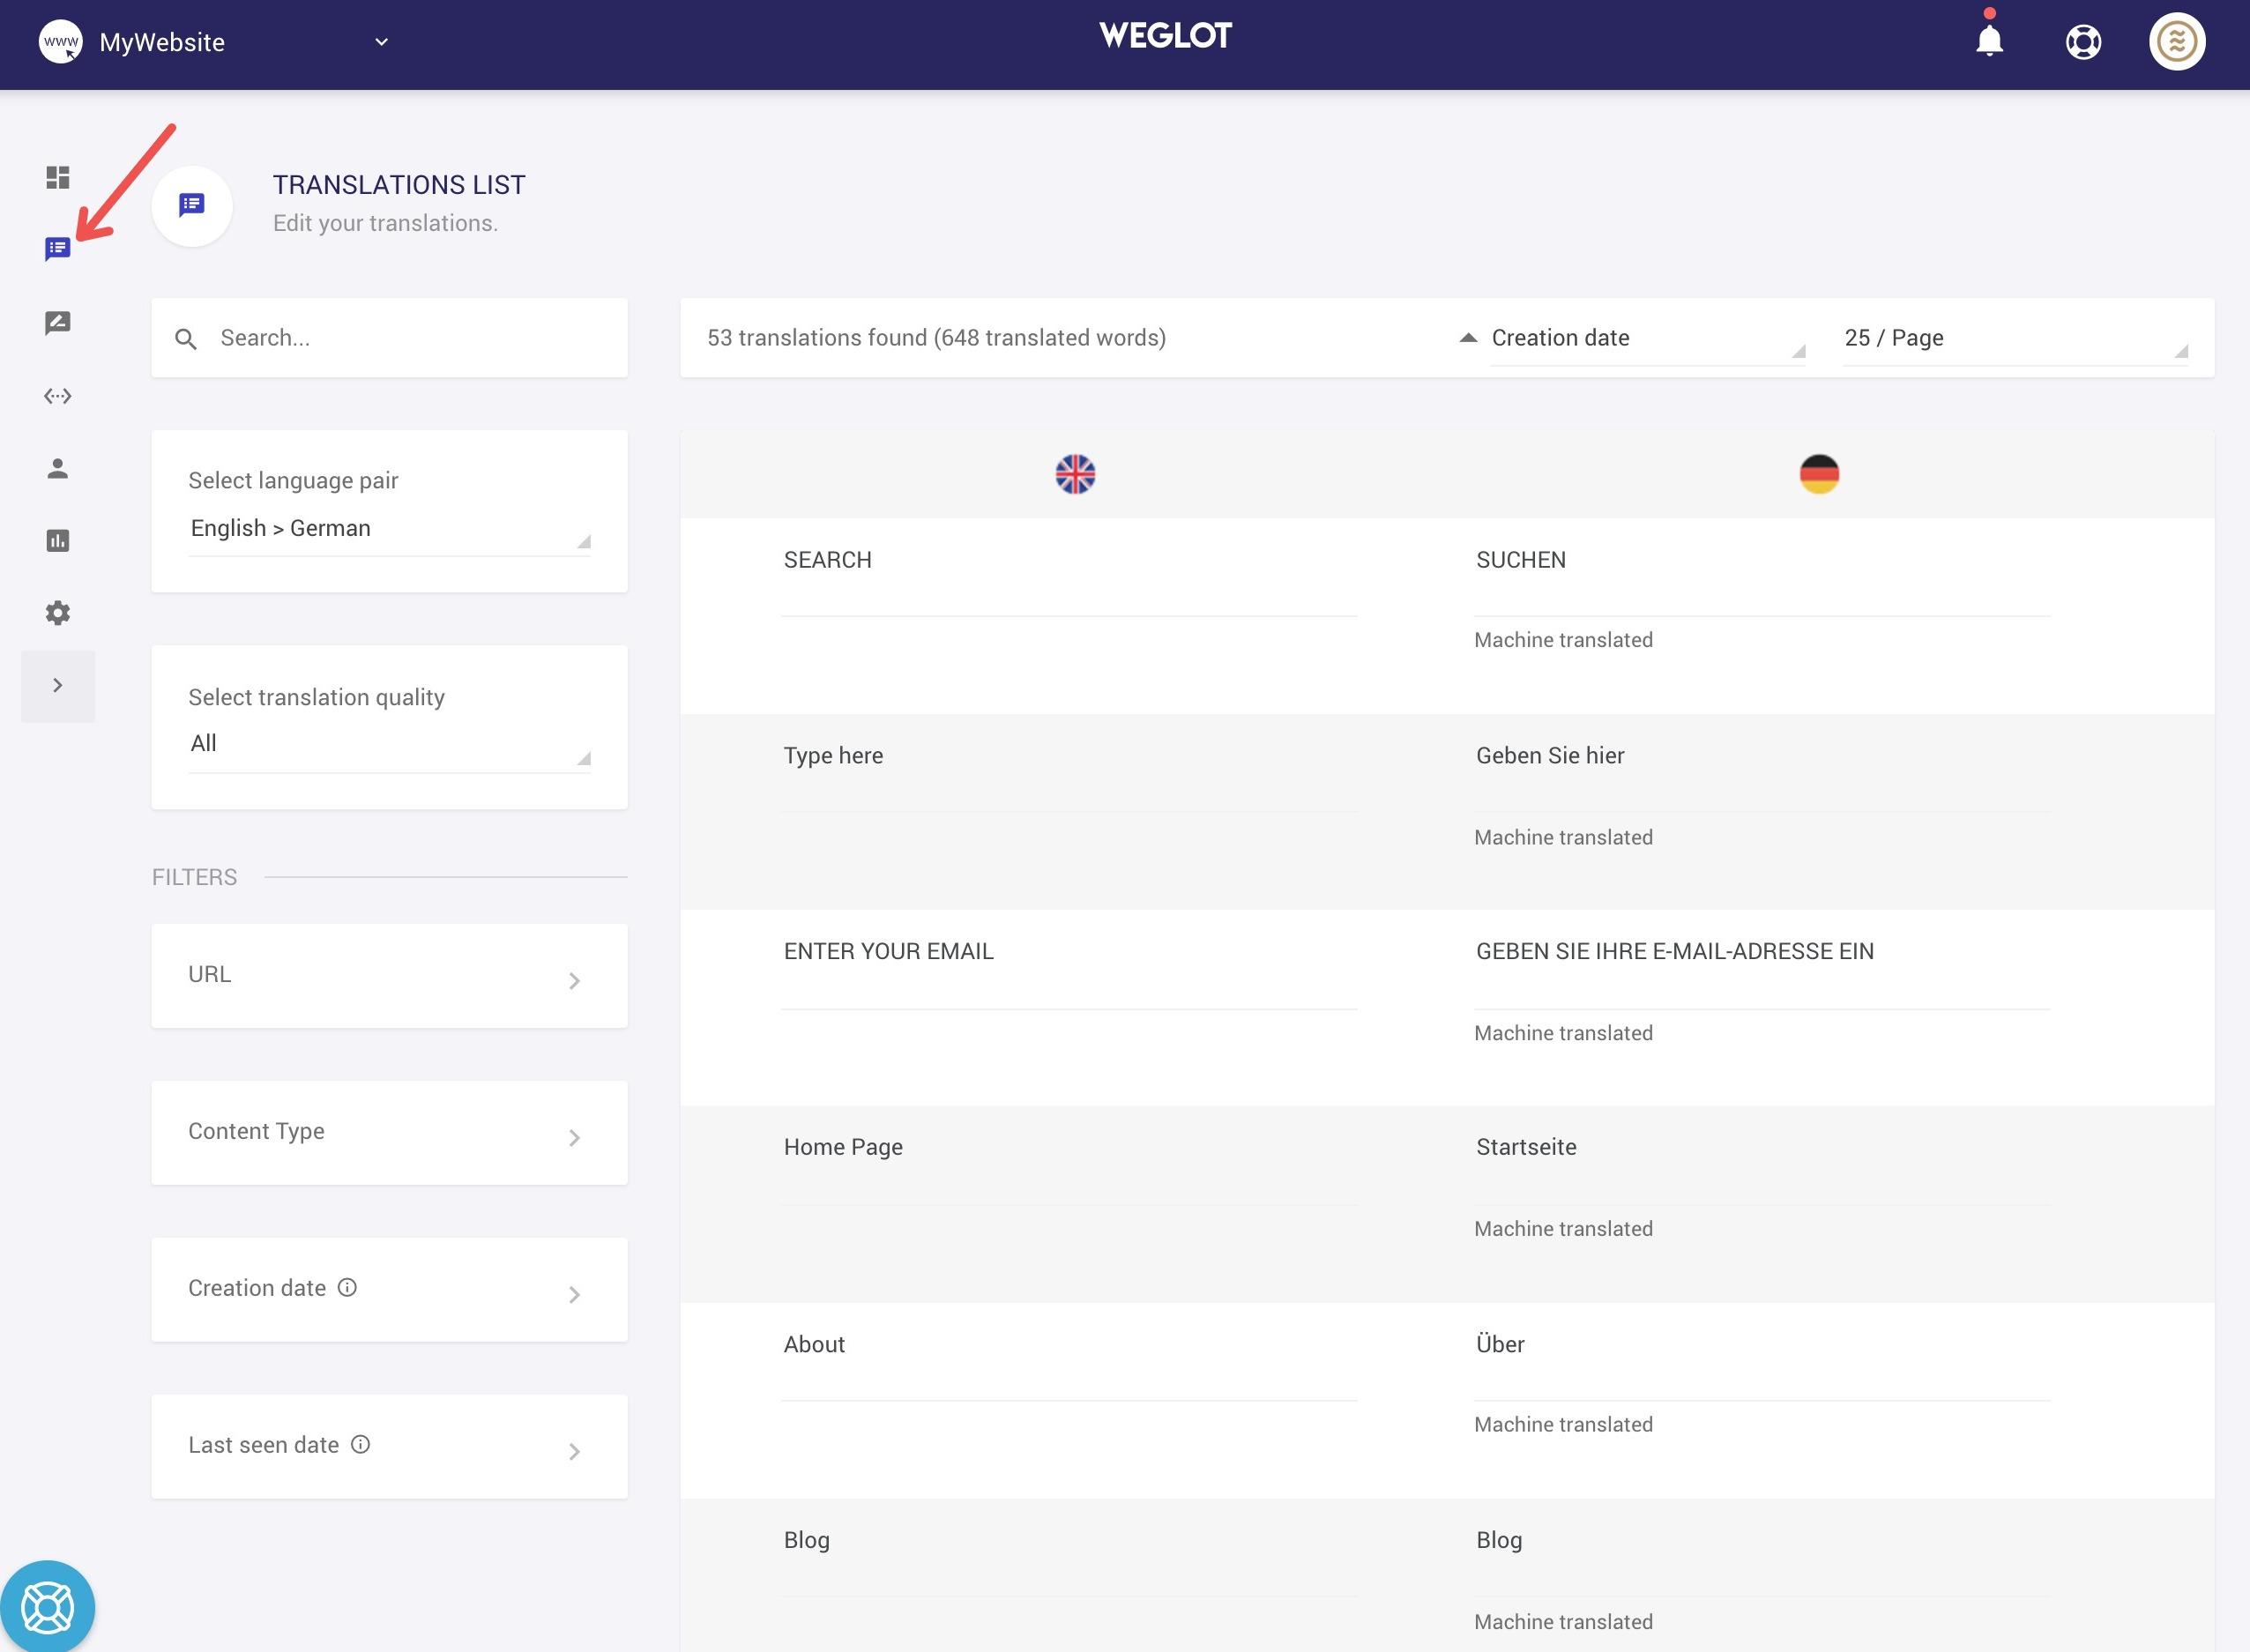 translation list weglot